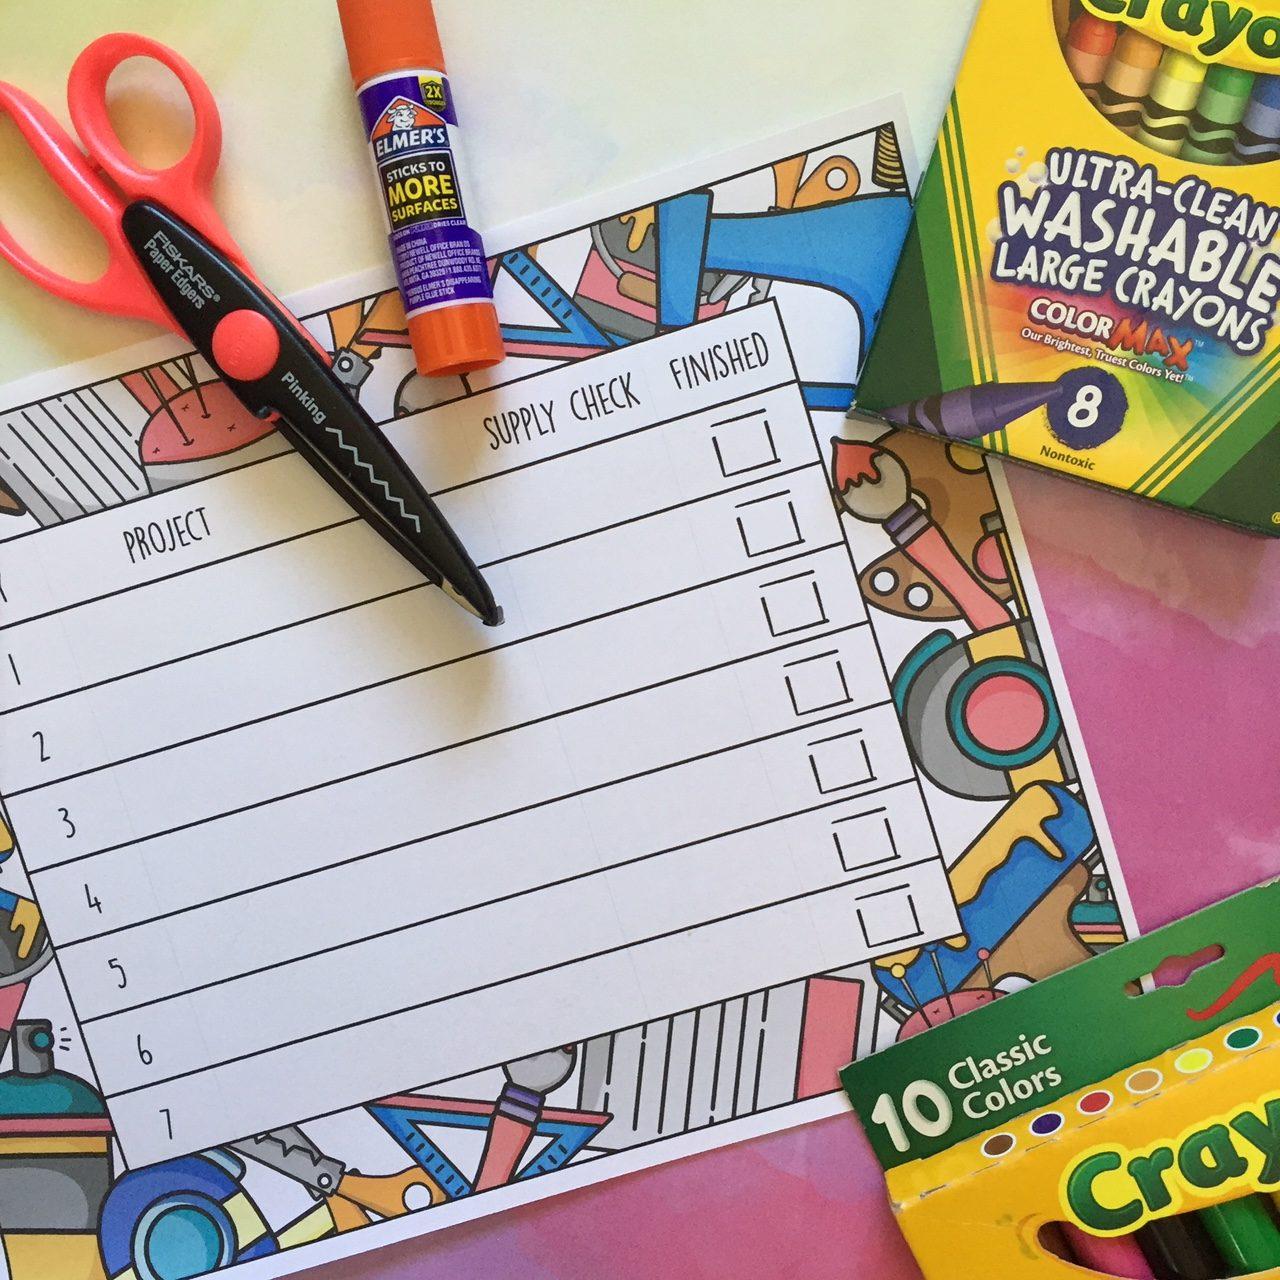 Chart to challenge children to set goals and achieve them.